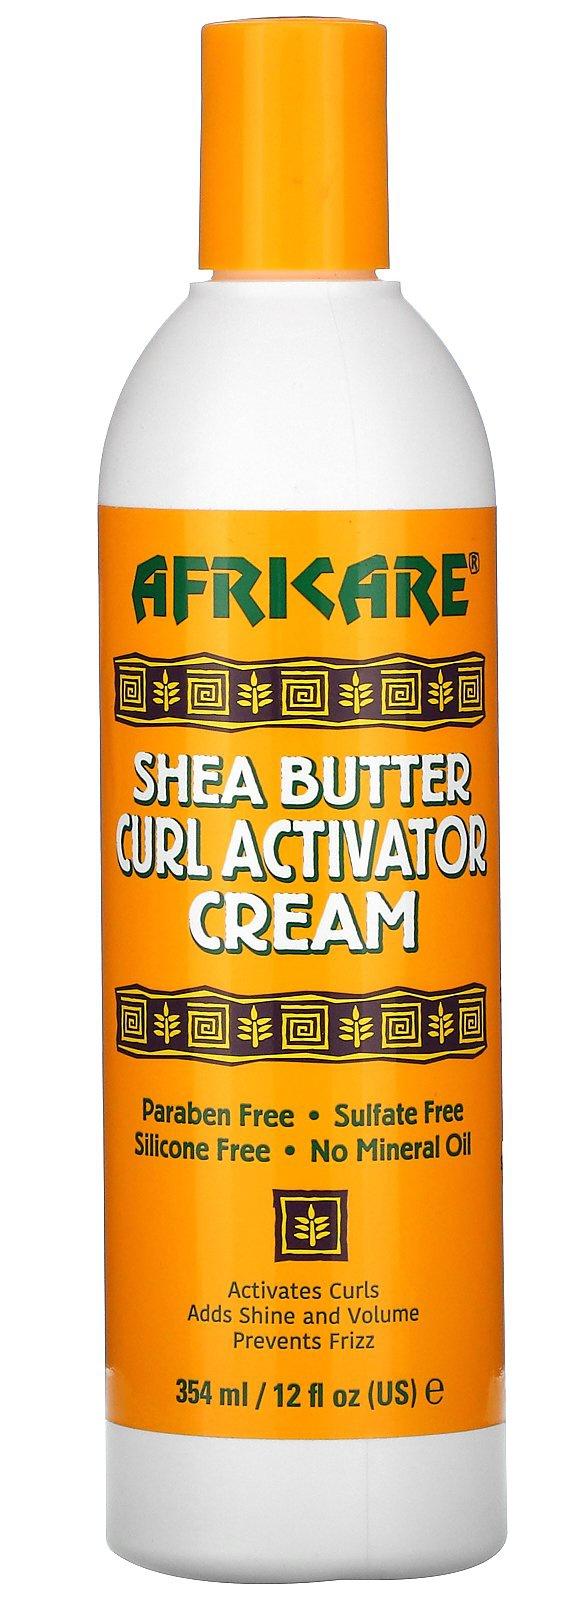 Cococare Africare, Shea Butter Curl Activator Cream